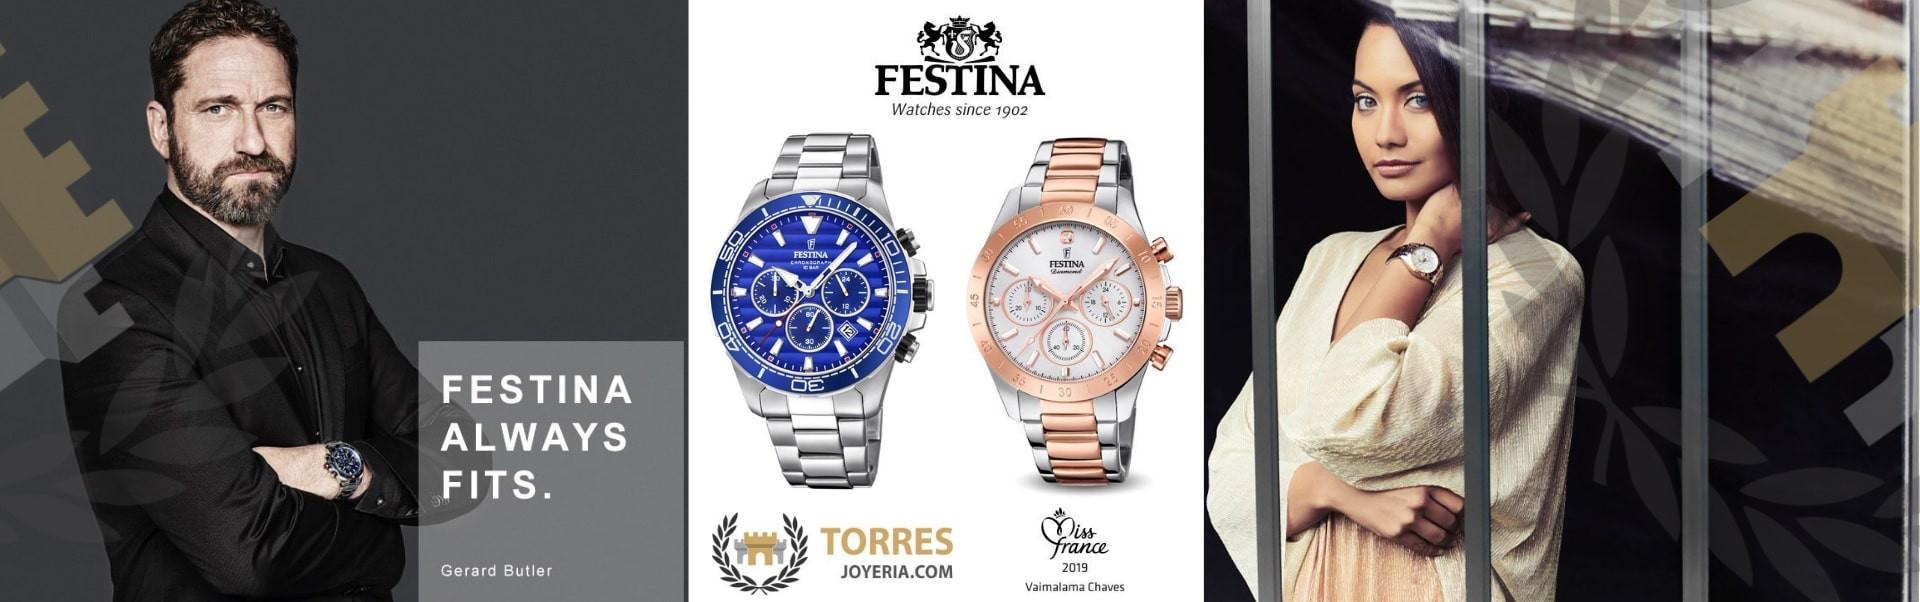 5a5c039391af Comprar relojes y joyas